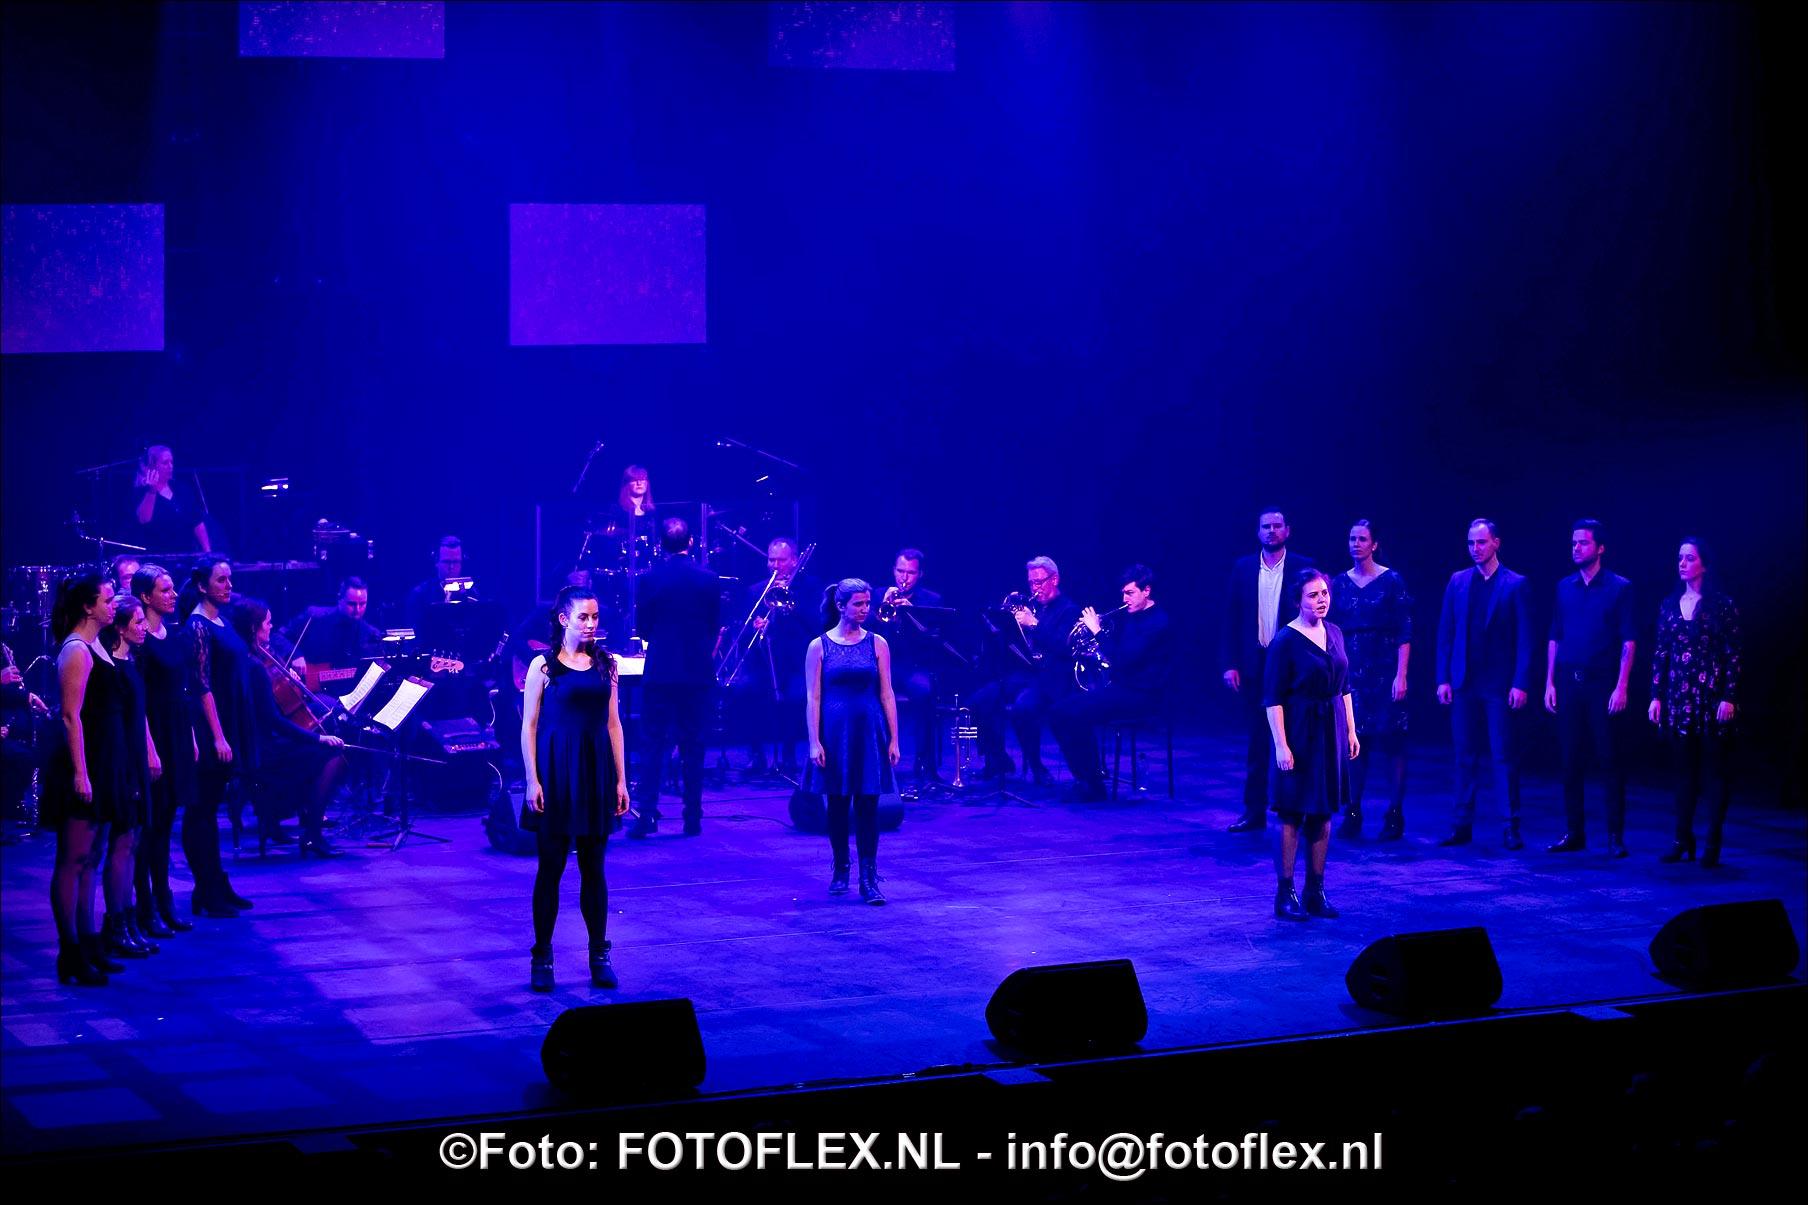 0608-CopyrightFOTOFLEX.NL07012020